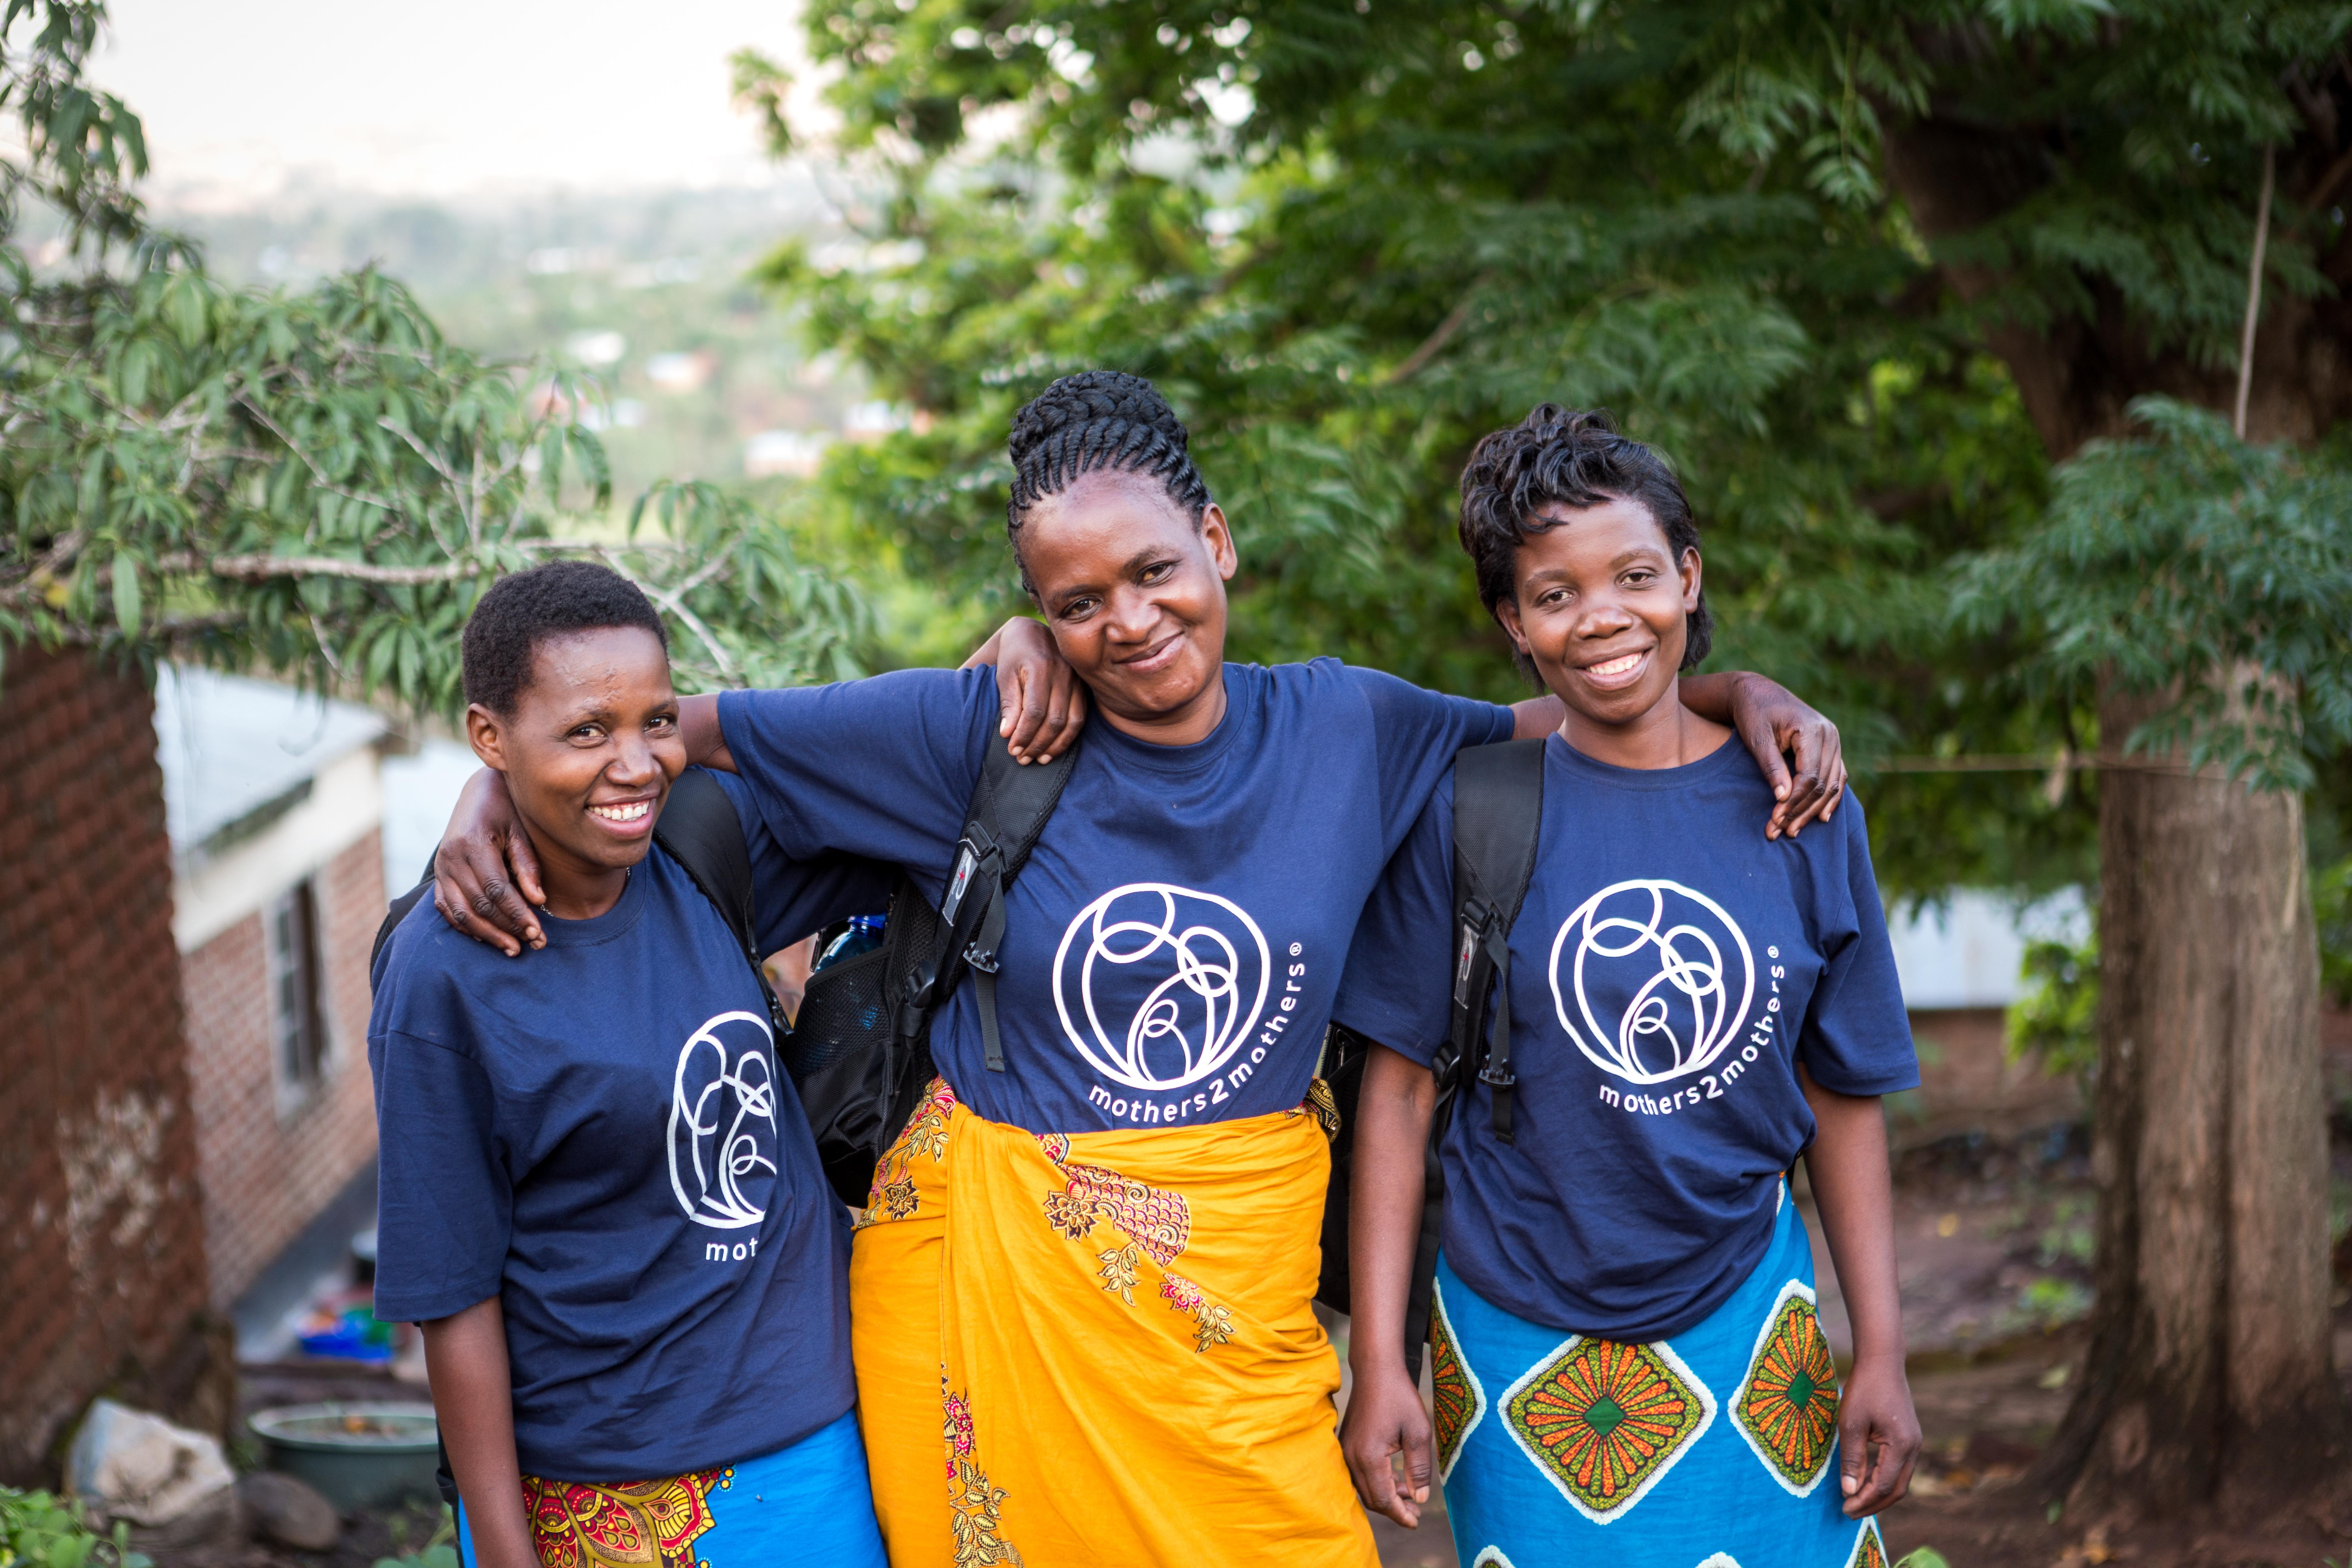 https://s12982.pcdn.co/wp-content/uploads/2014/03/Mentor-Mothers-Malawi.jpg